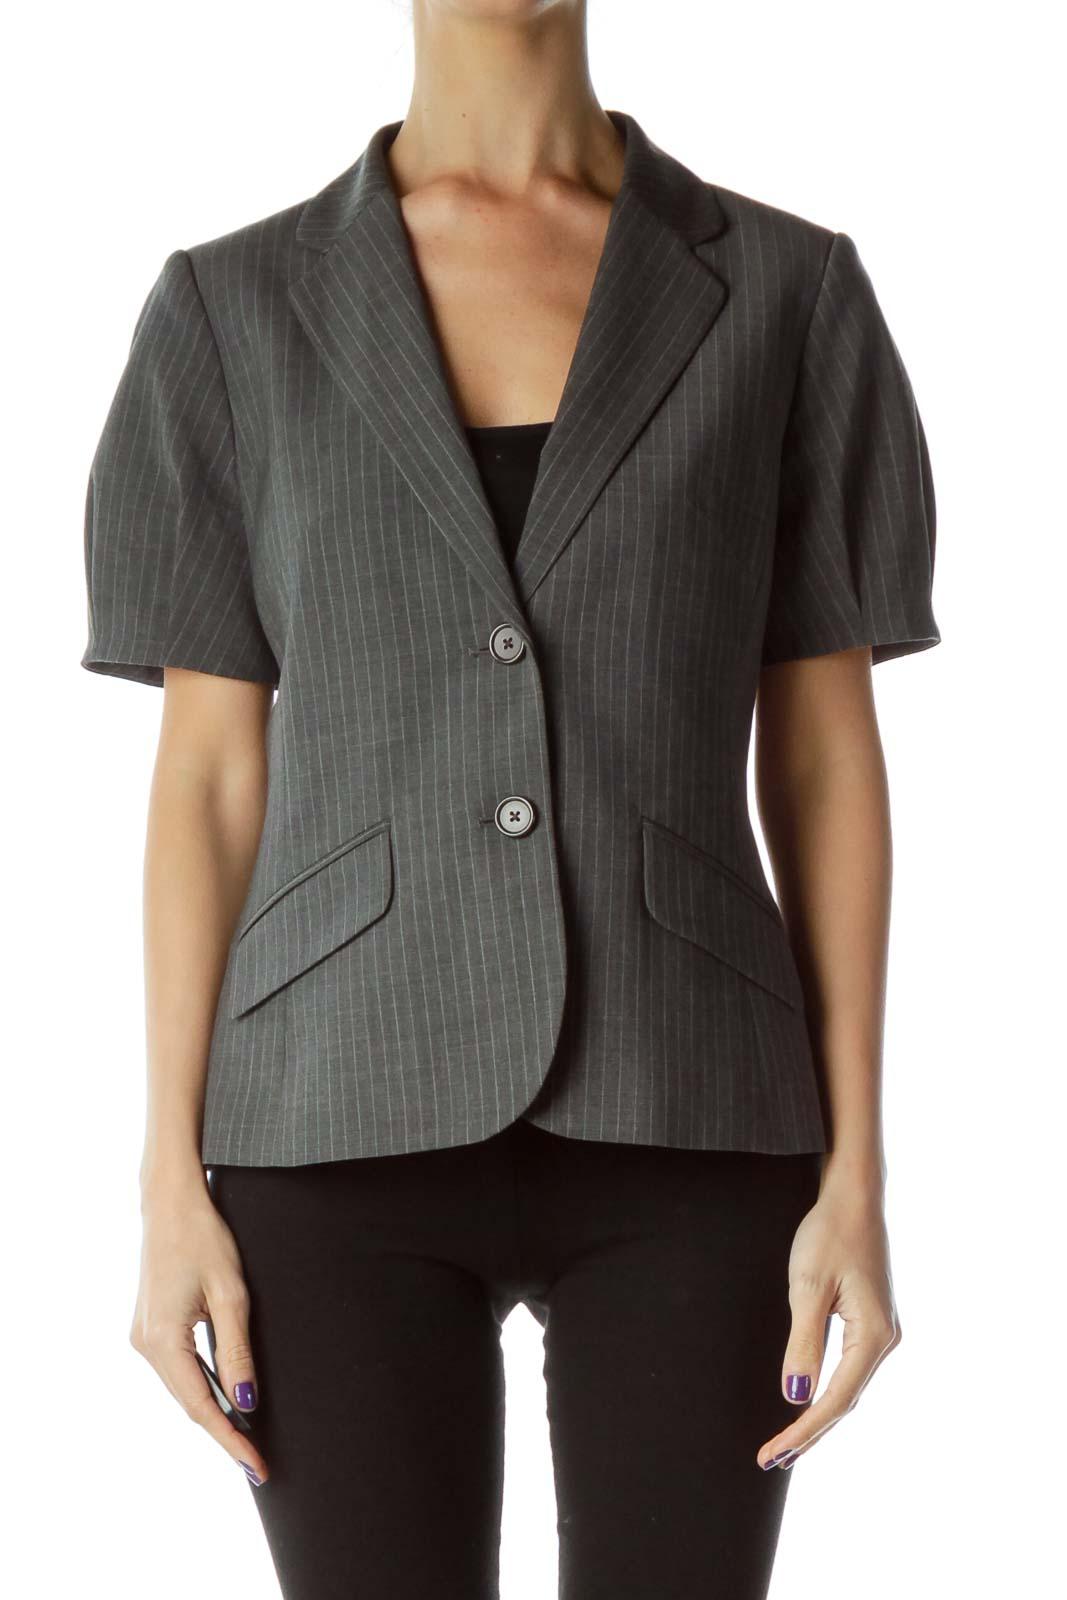 Gray Pinstripe Suit Jacket